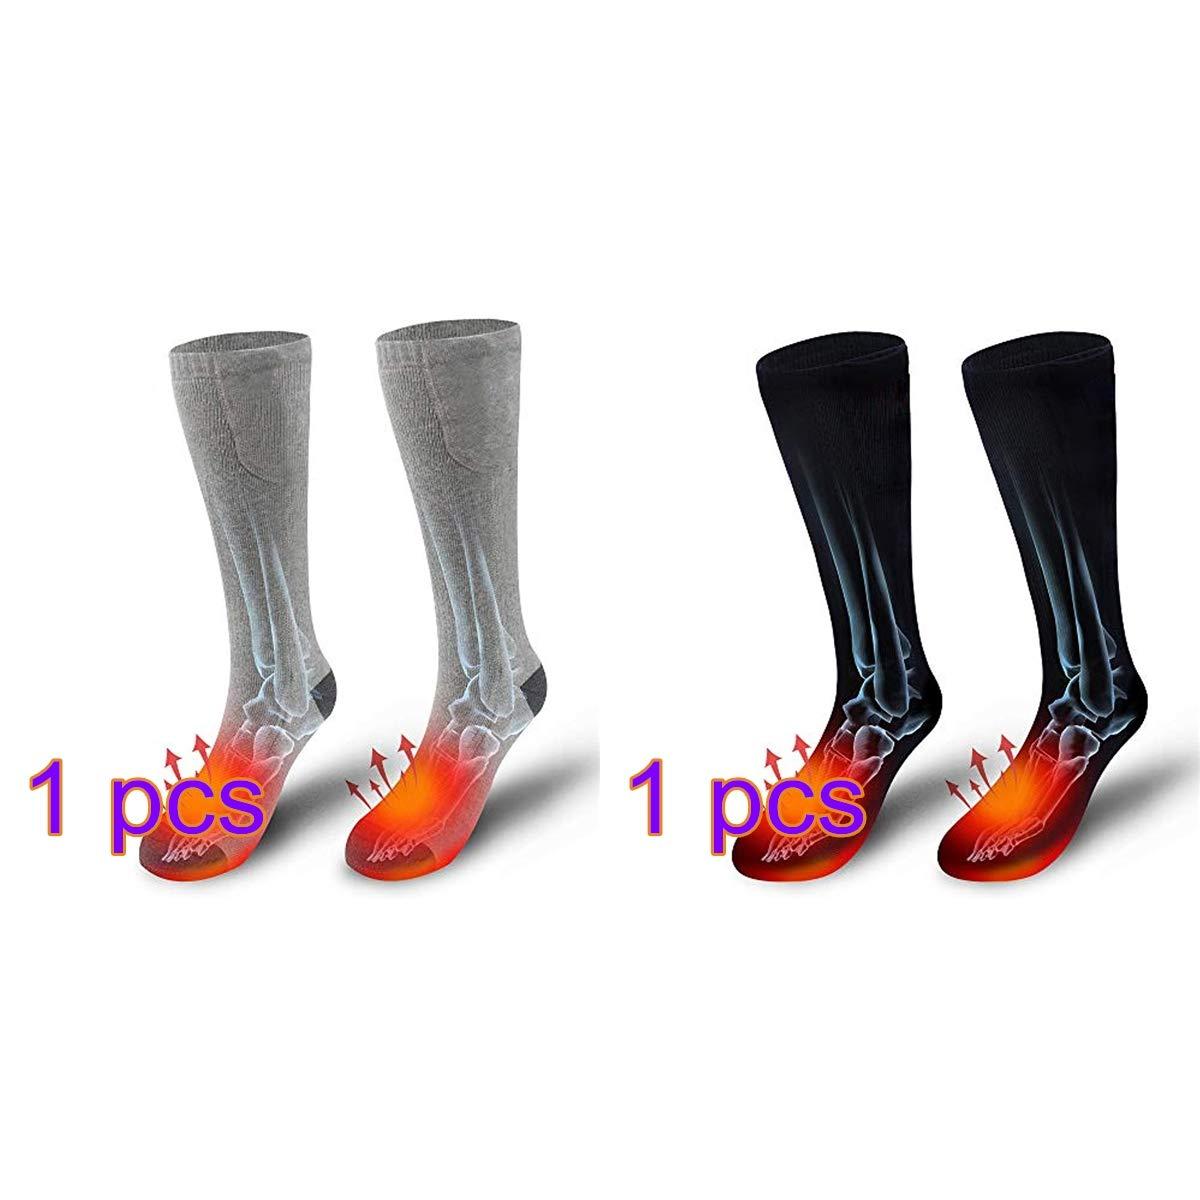 QINGFA Heated Socks,Winter Upgrade Heating Socks USB Rechargeable Battery Electric Heating Socks Three-Level Thermostat Sports Outdoor Novelty Warm Heating Sock,Climbing Skiing Foot Heater Warmer